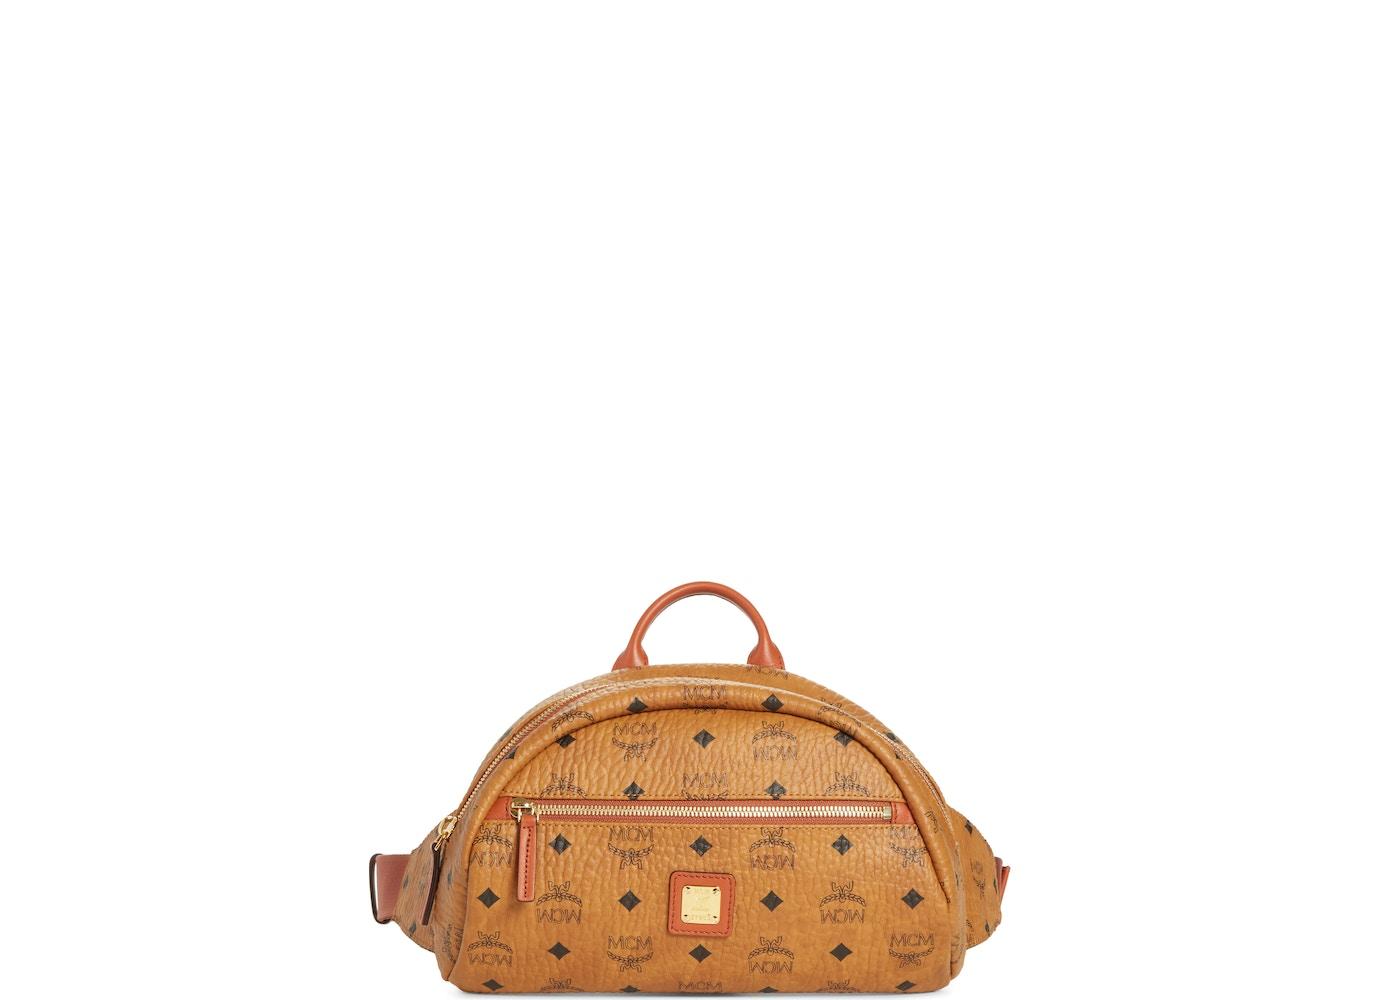 e2768ee735b MCM Vintage Belt Bag Visetos Nordstrom Exclusive Small Cognac. Visetos  Nordstrom Exclusive Small Cognac